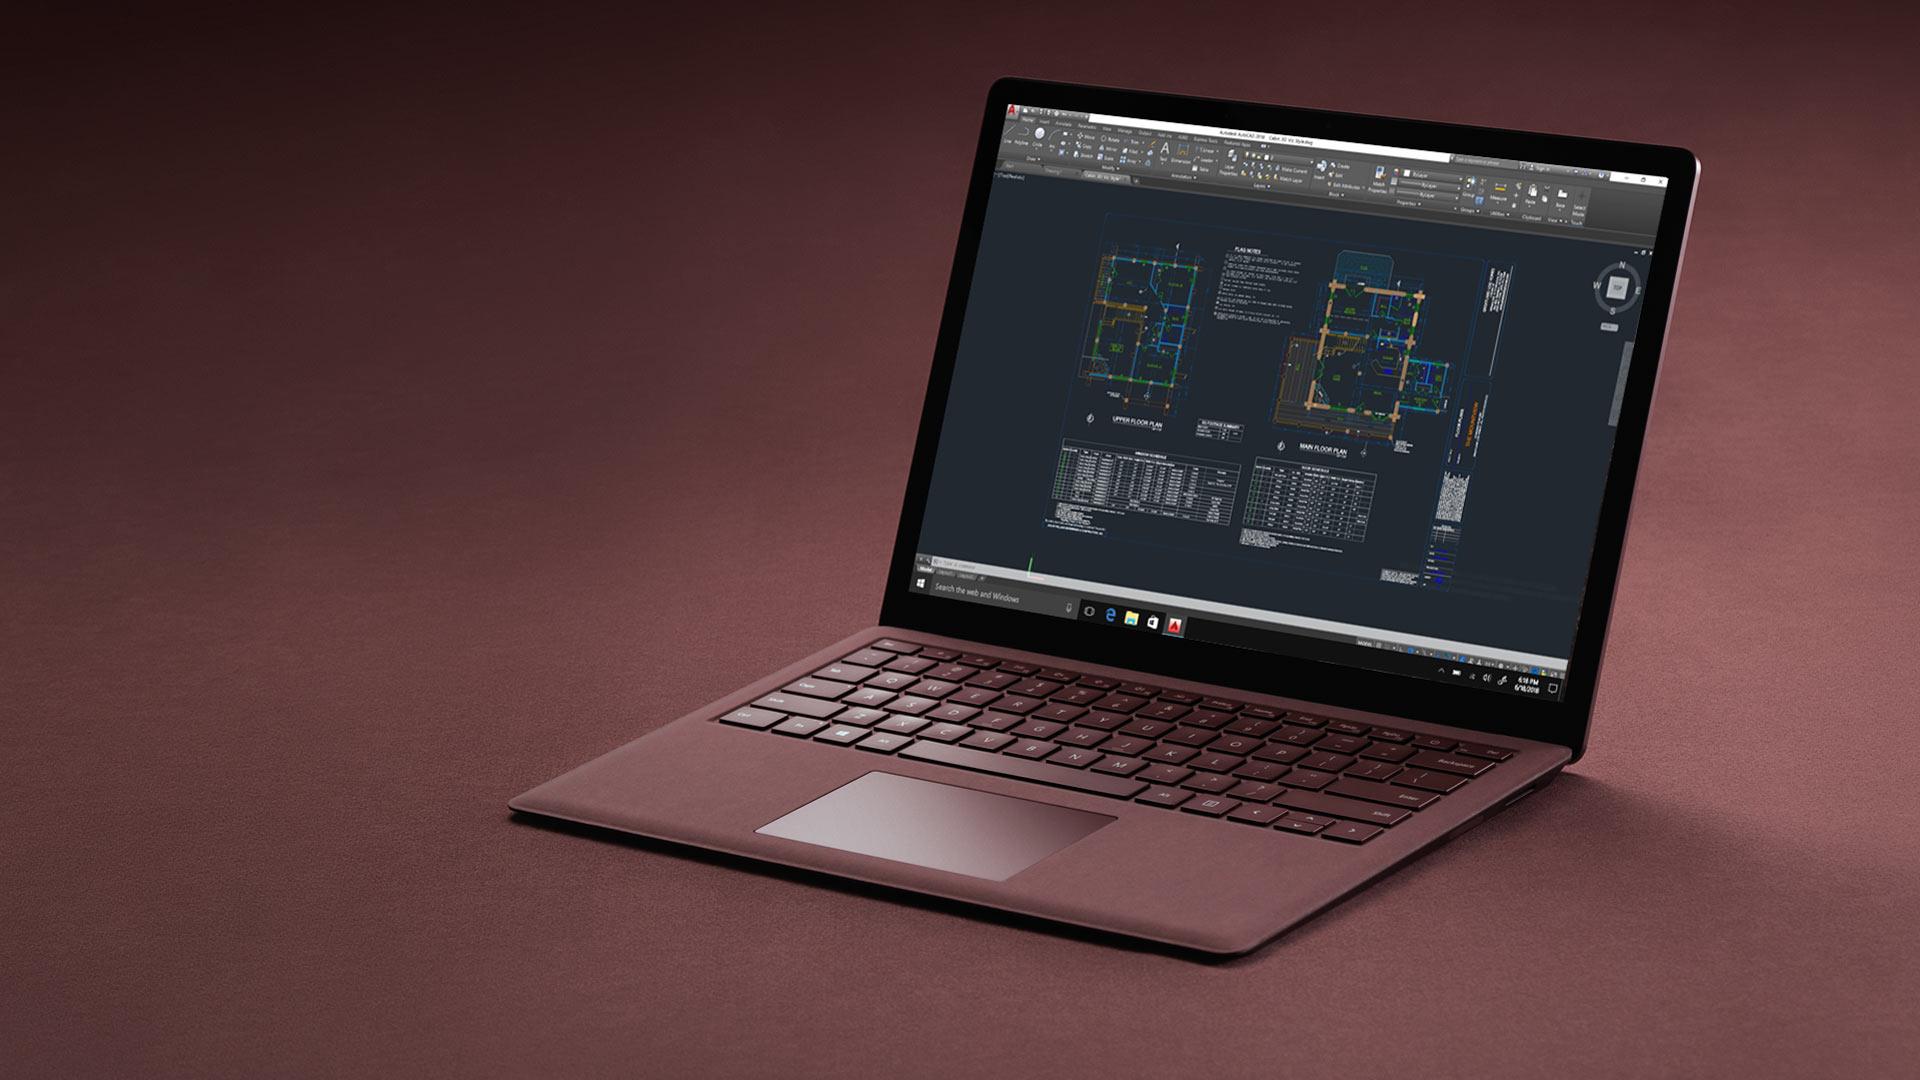 酒紅色 Surface Laptop 顯示 AutoCAD 畫面。